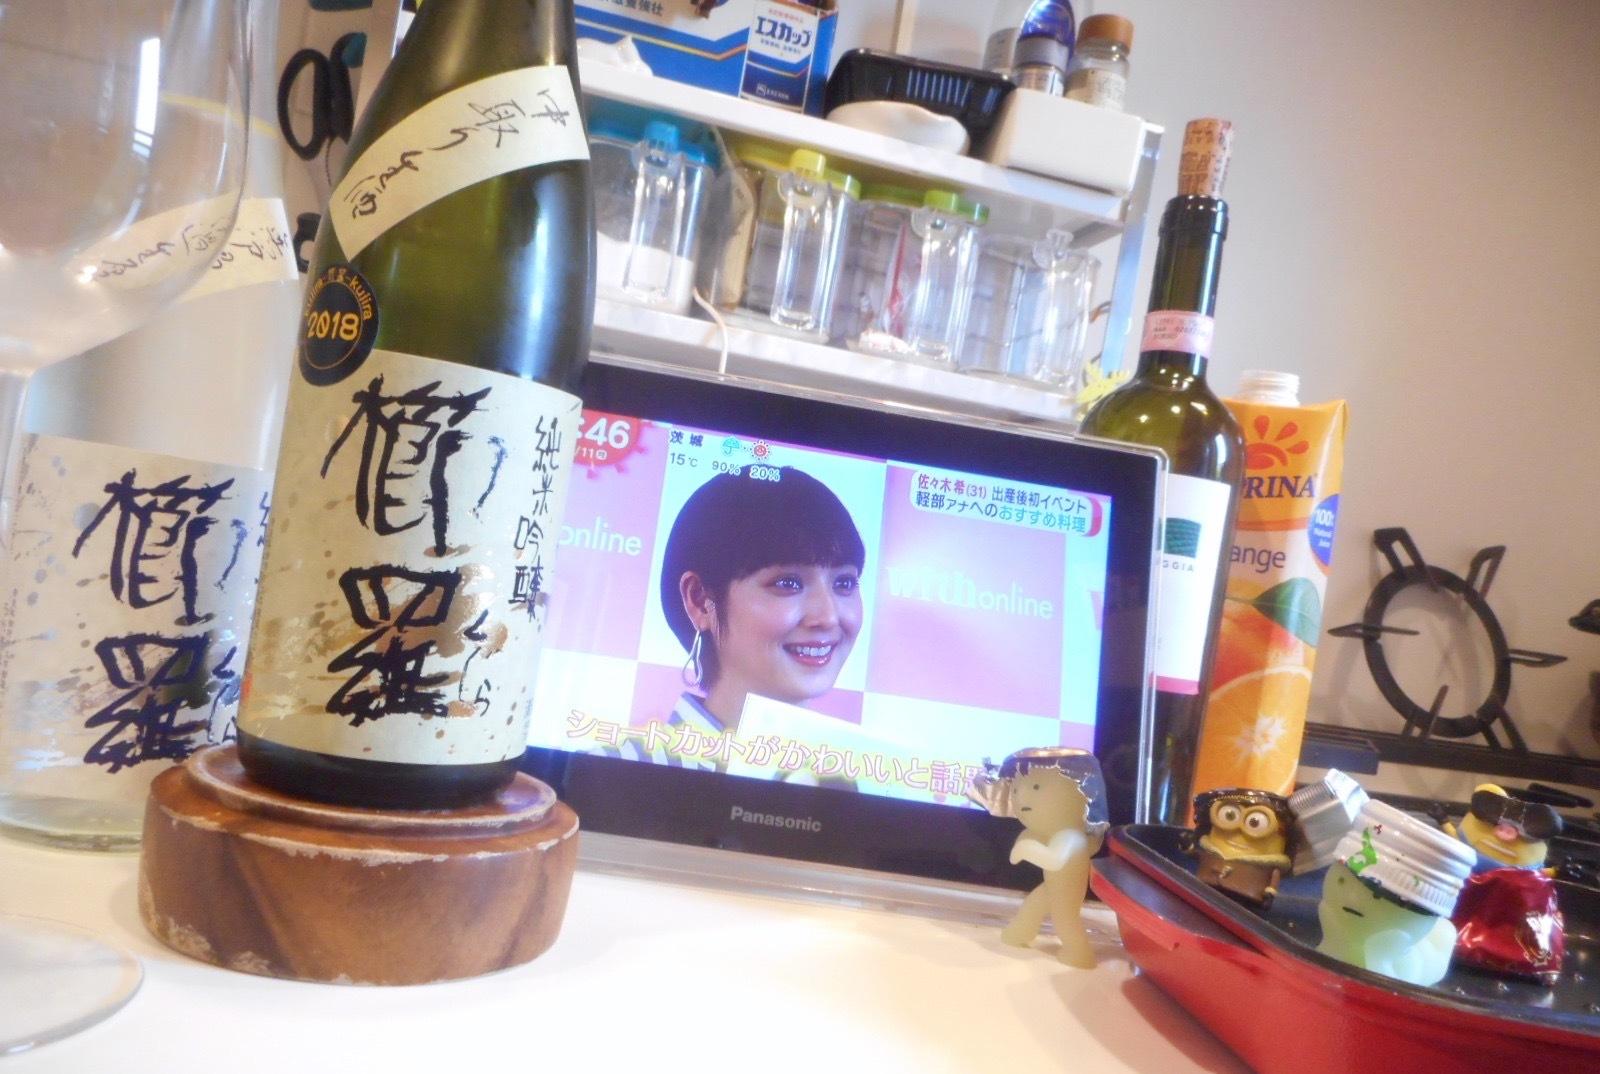 kujira_jungin30by6.jpg